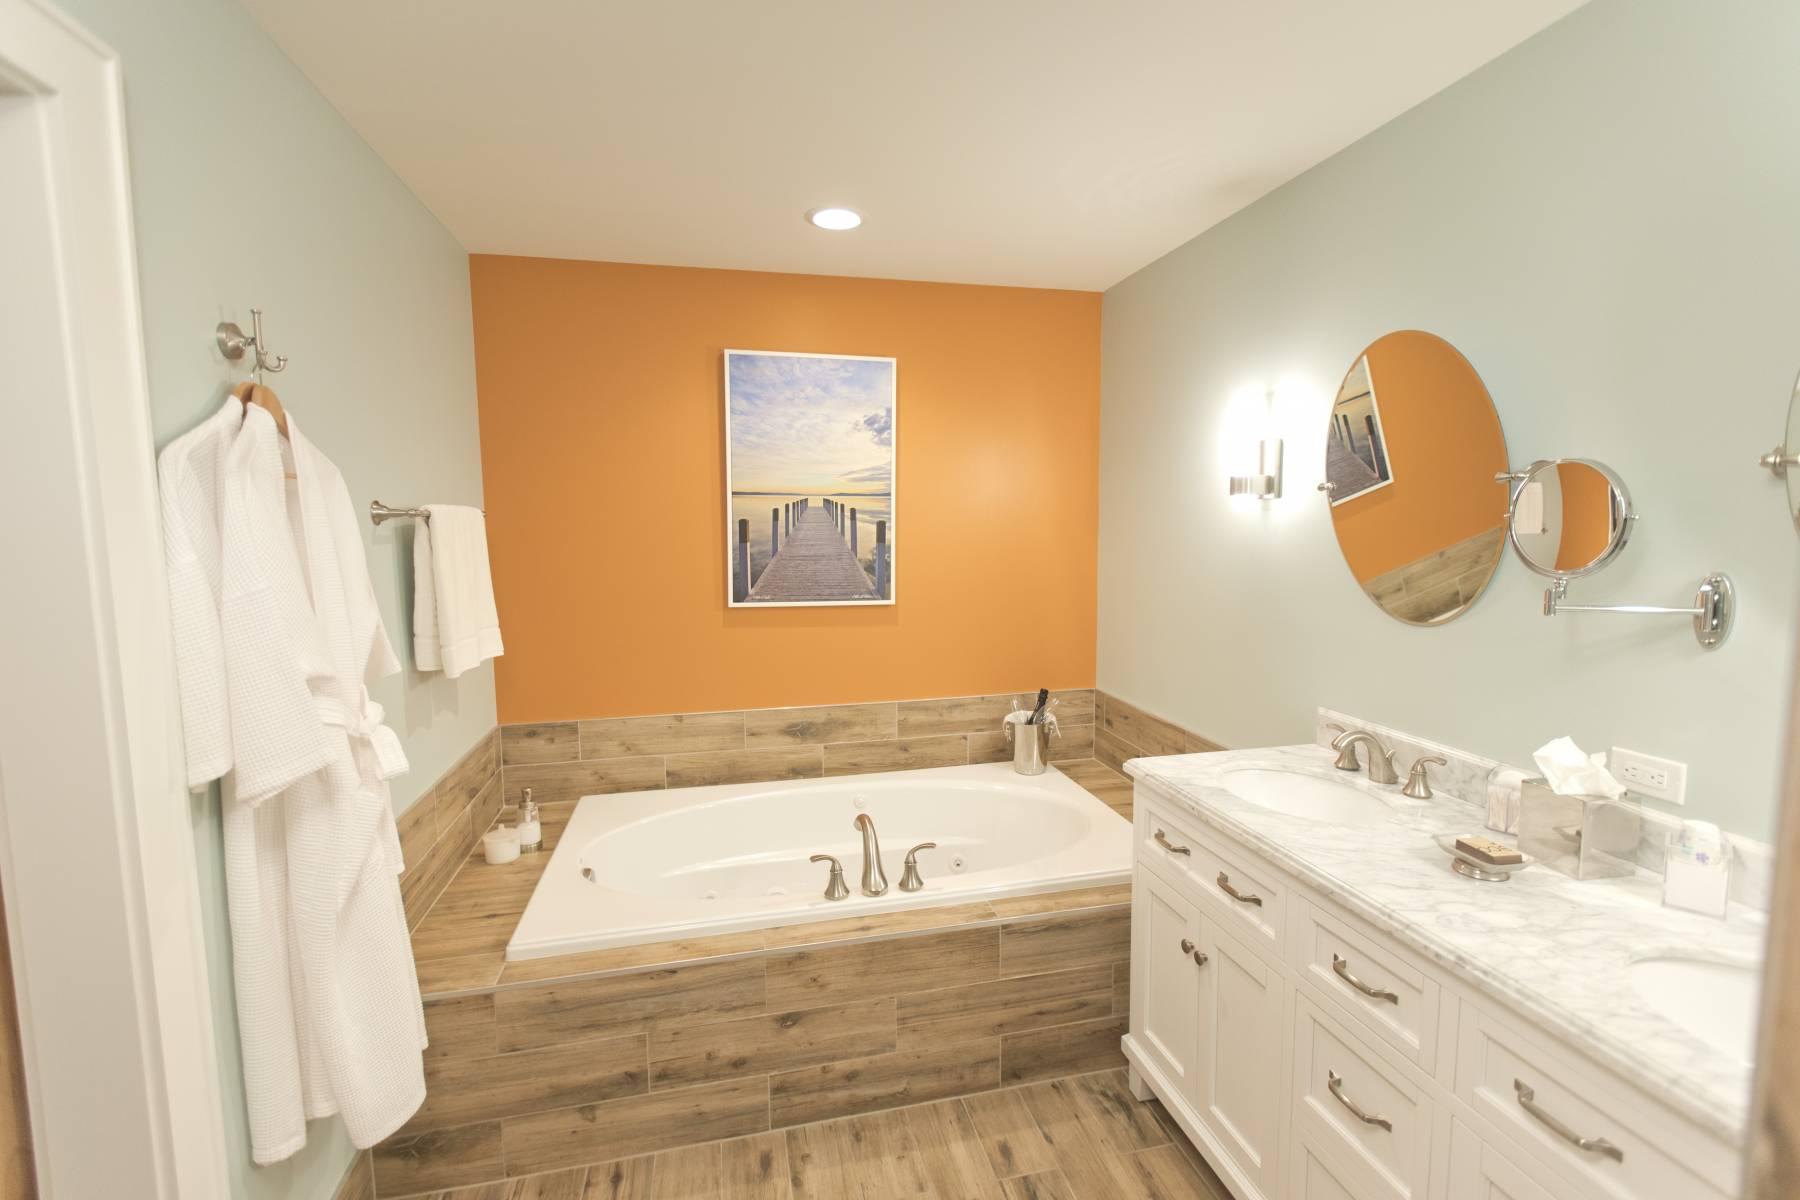 Bainbridge Bathroom with two person spa tub and heated floors.